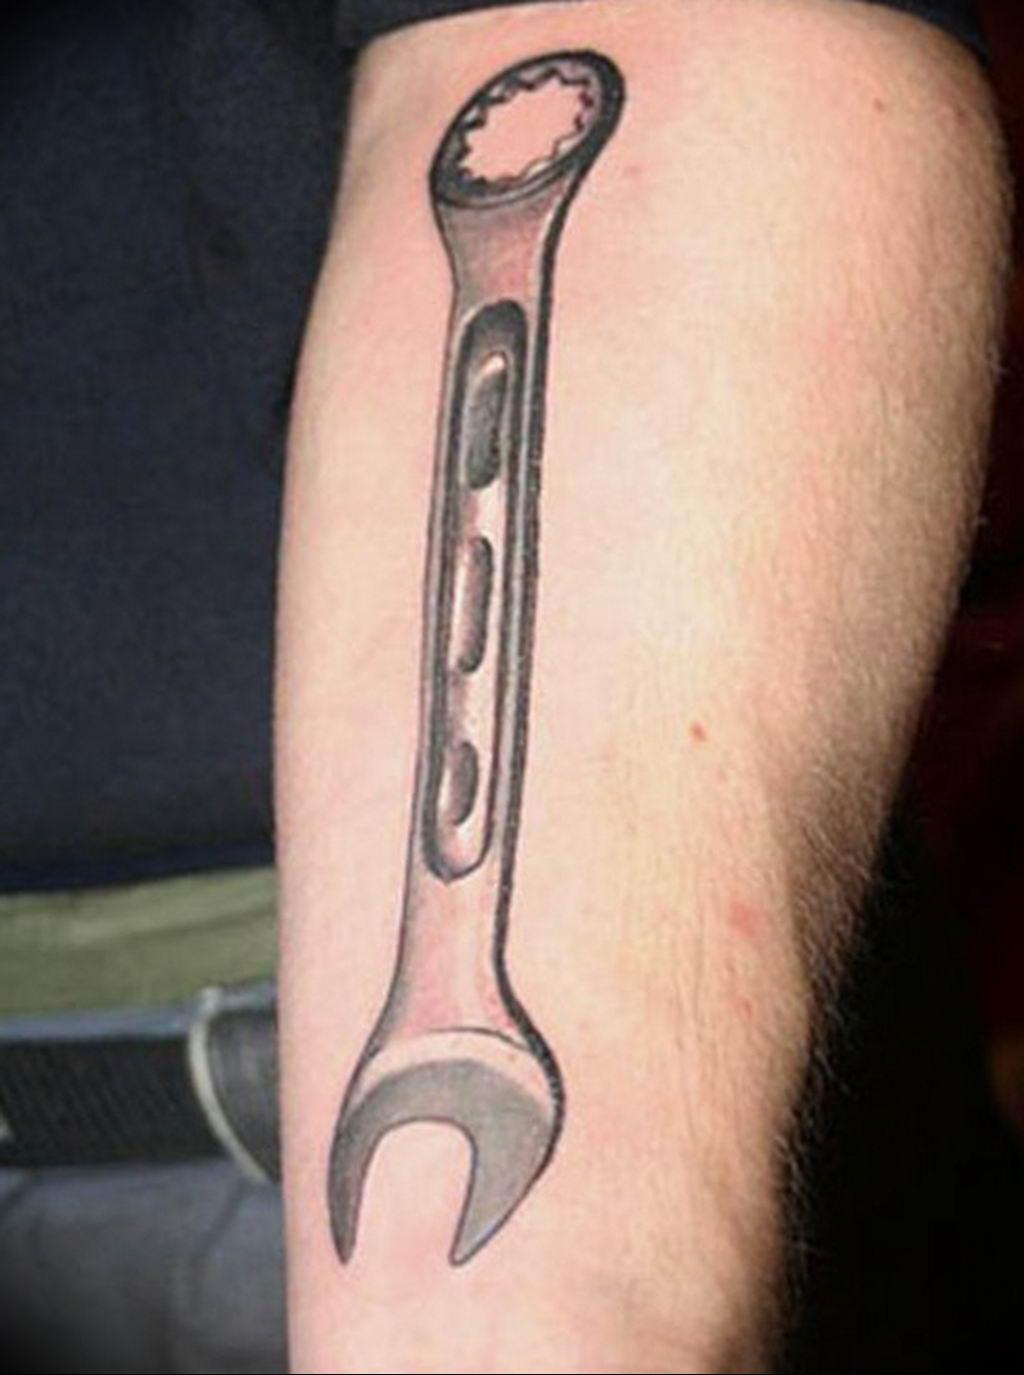 Фото тату гаечный ключ 21.08.2019 №013 - tattoo wrench - tatufoto.com